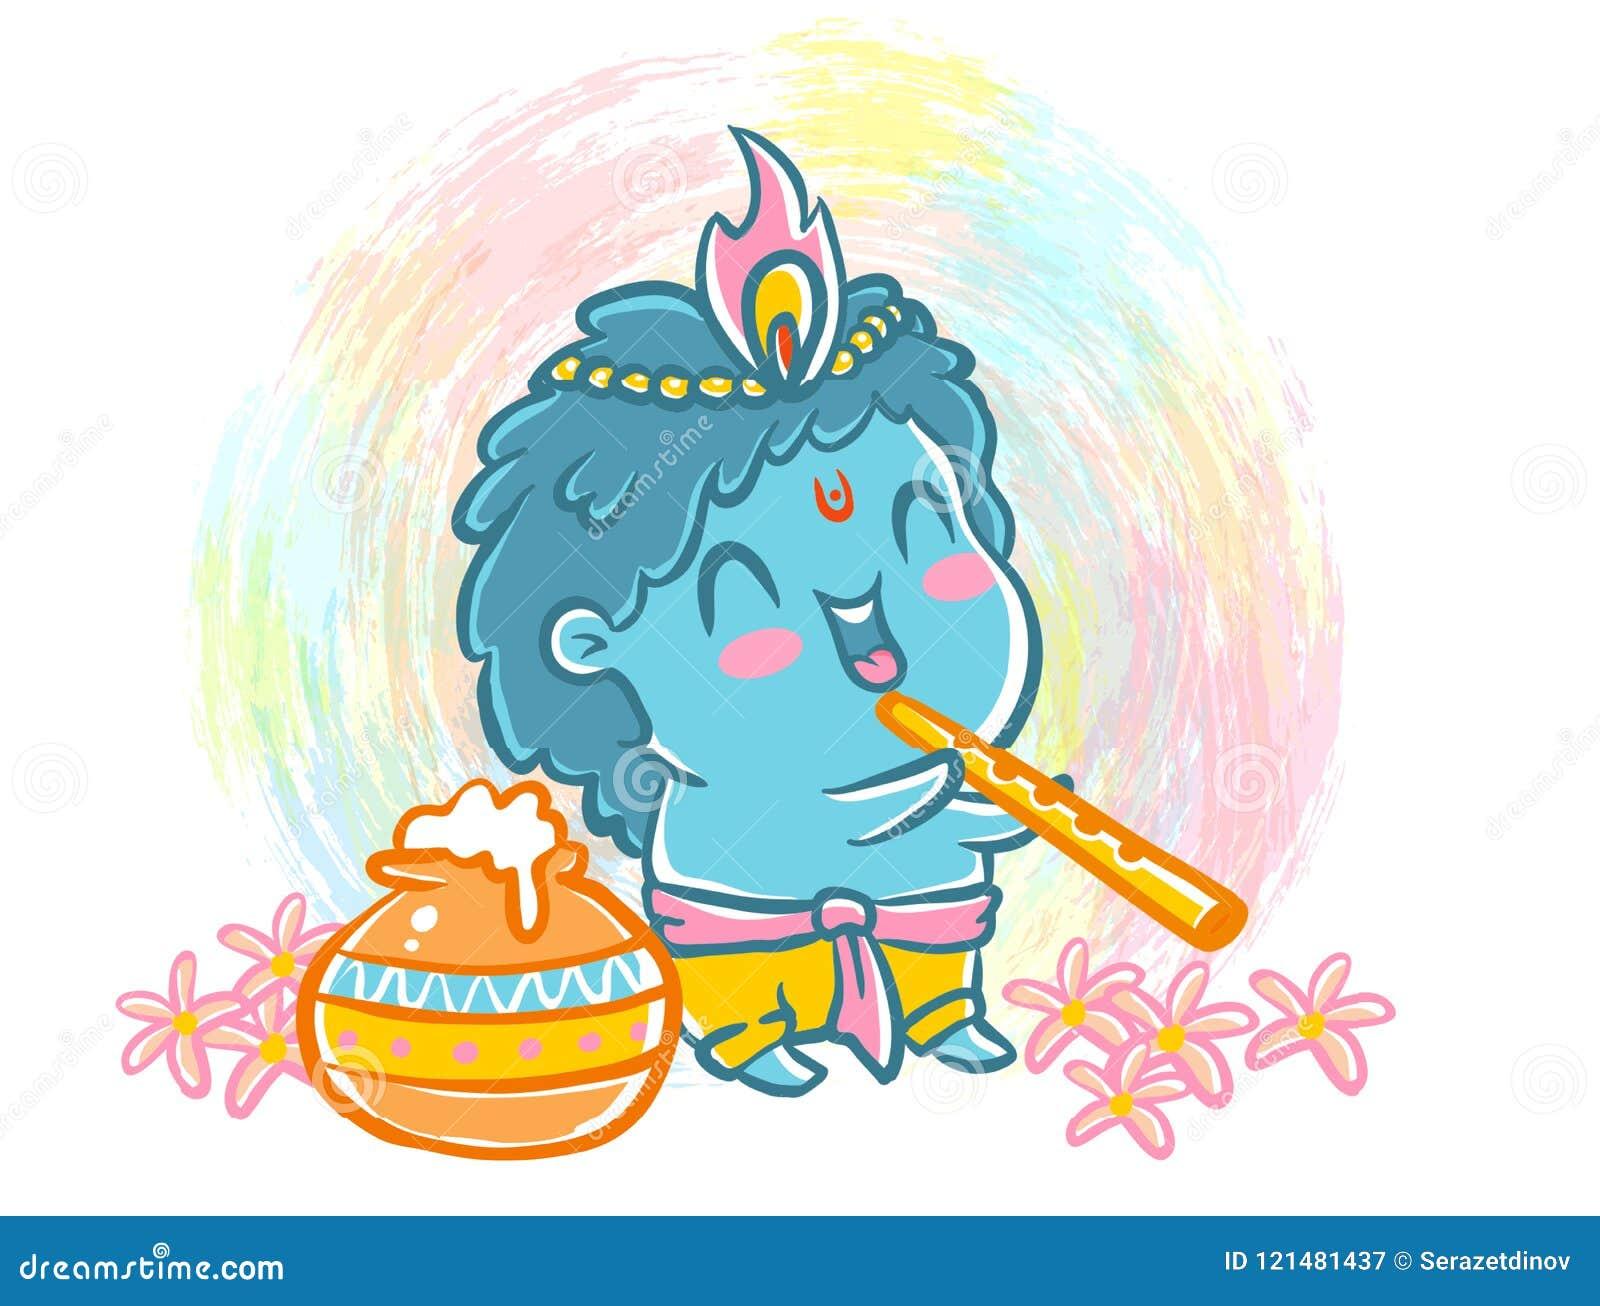 vector illustration kawaii style krishna janmashtami little krishna kawaii style little krishna kawaii style 121481437